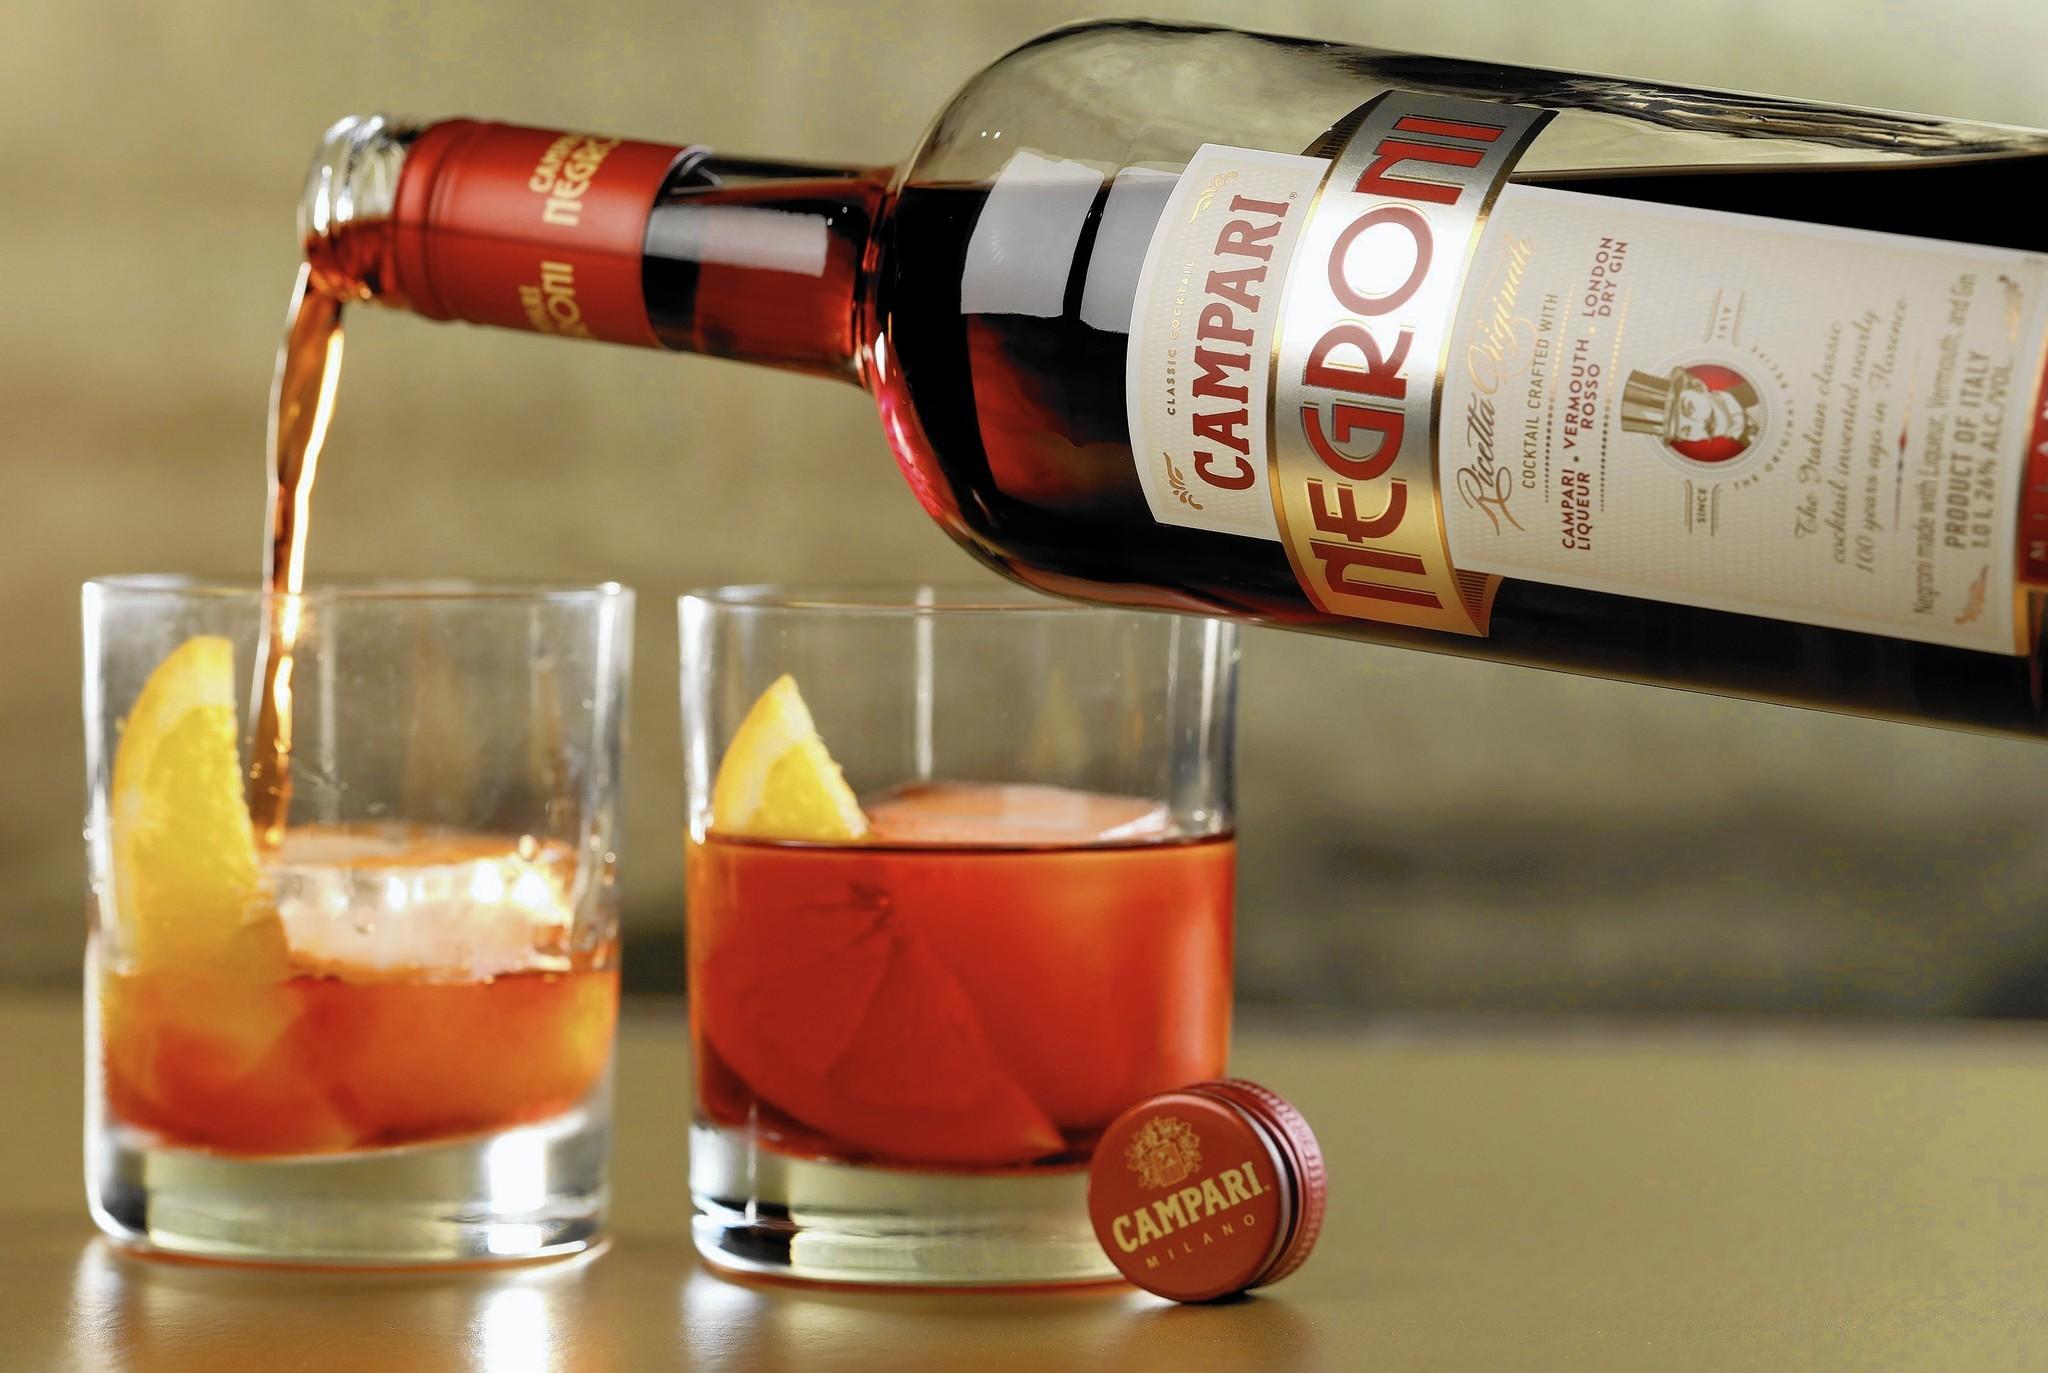 Negroni alcohol